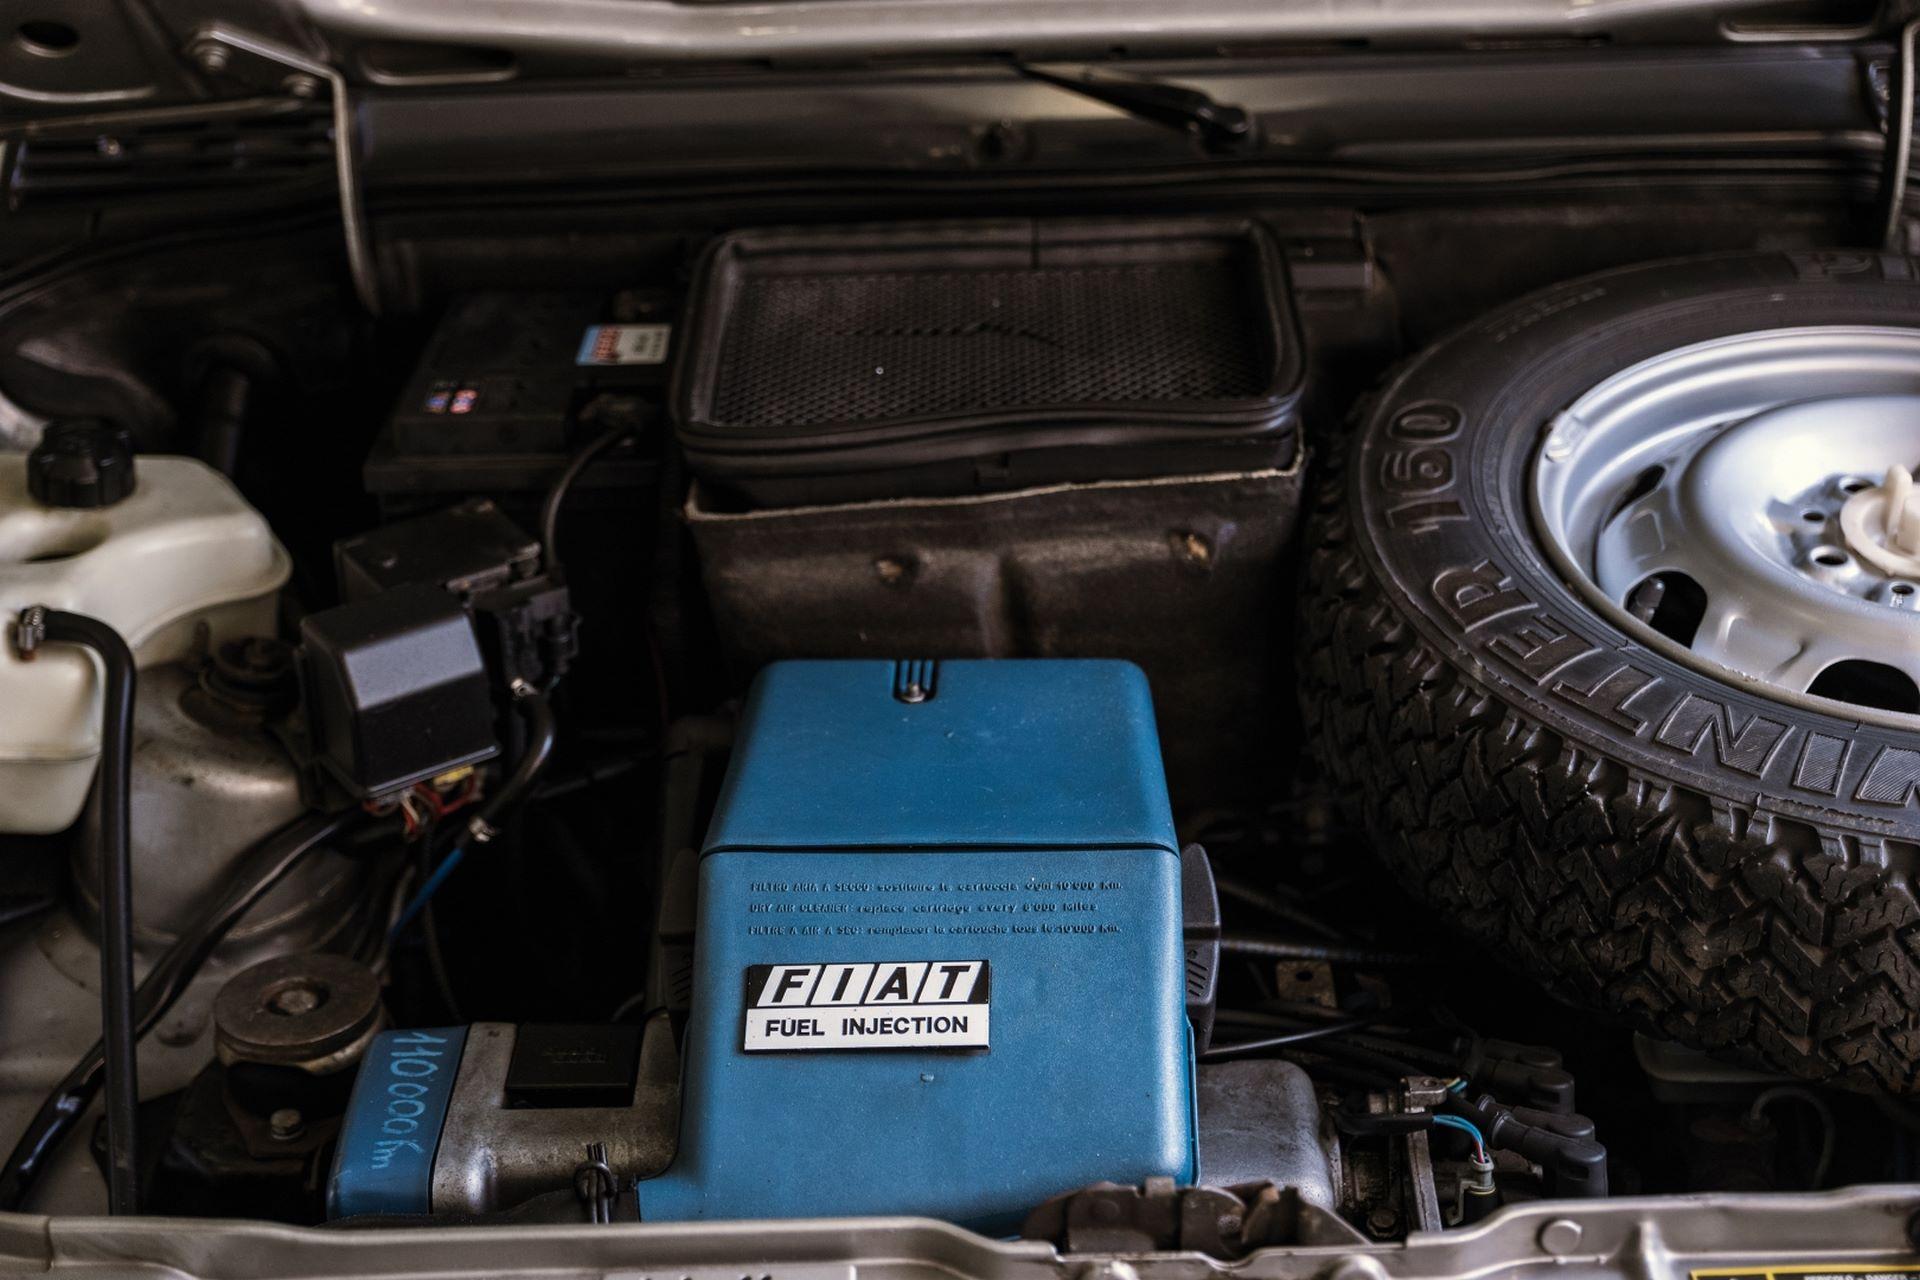 Fiat-Panda-Gianni-Agnelli-auction-10